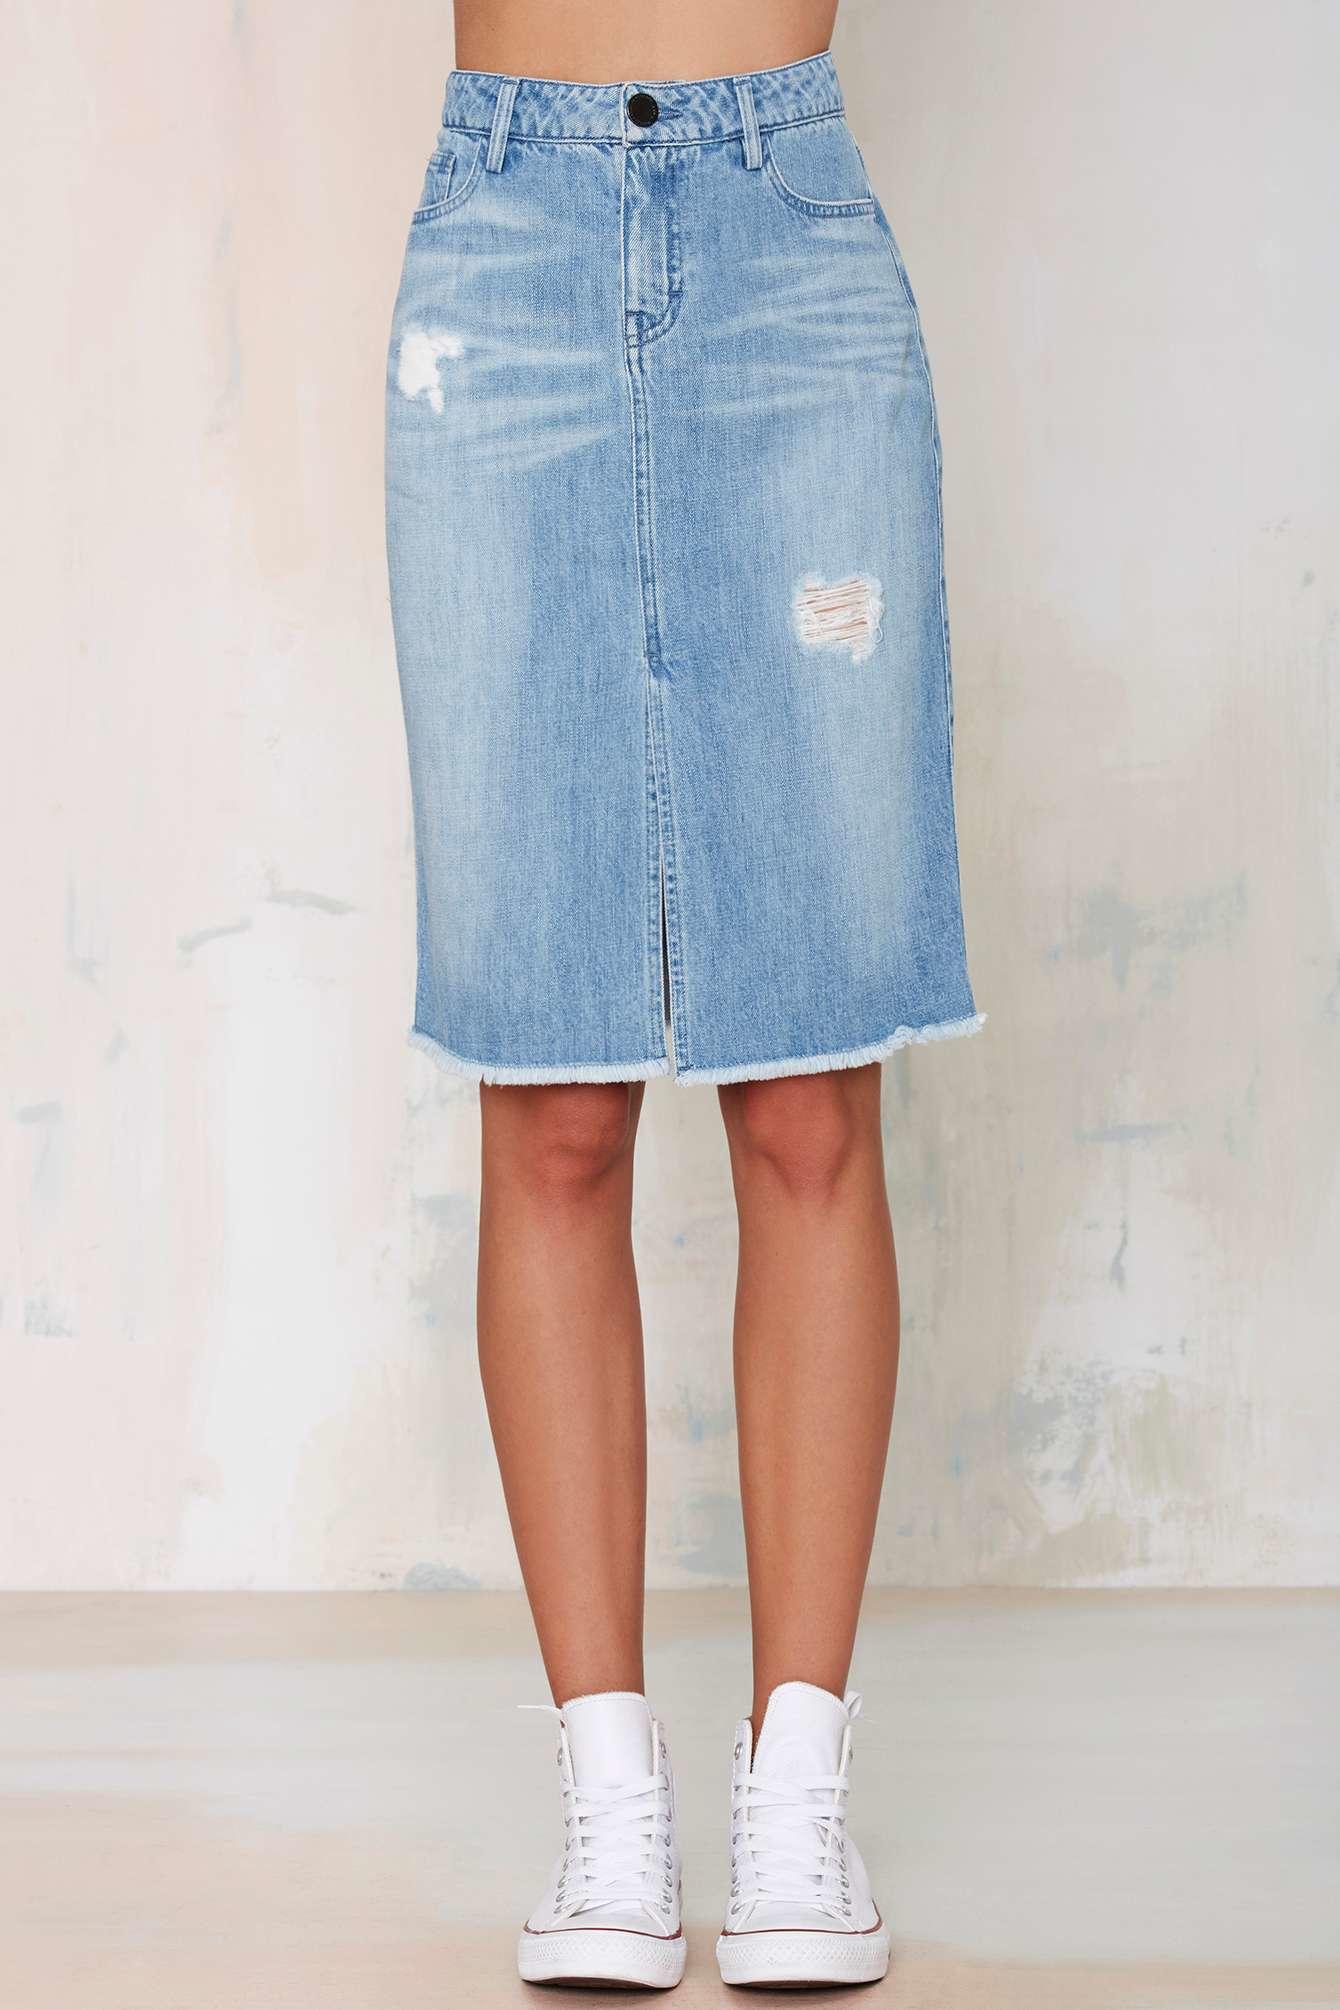 etienne marcel destroyed denim skirt in blue lyst